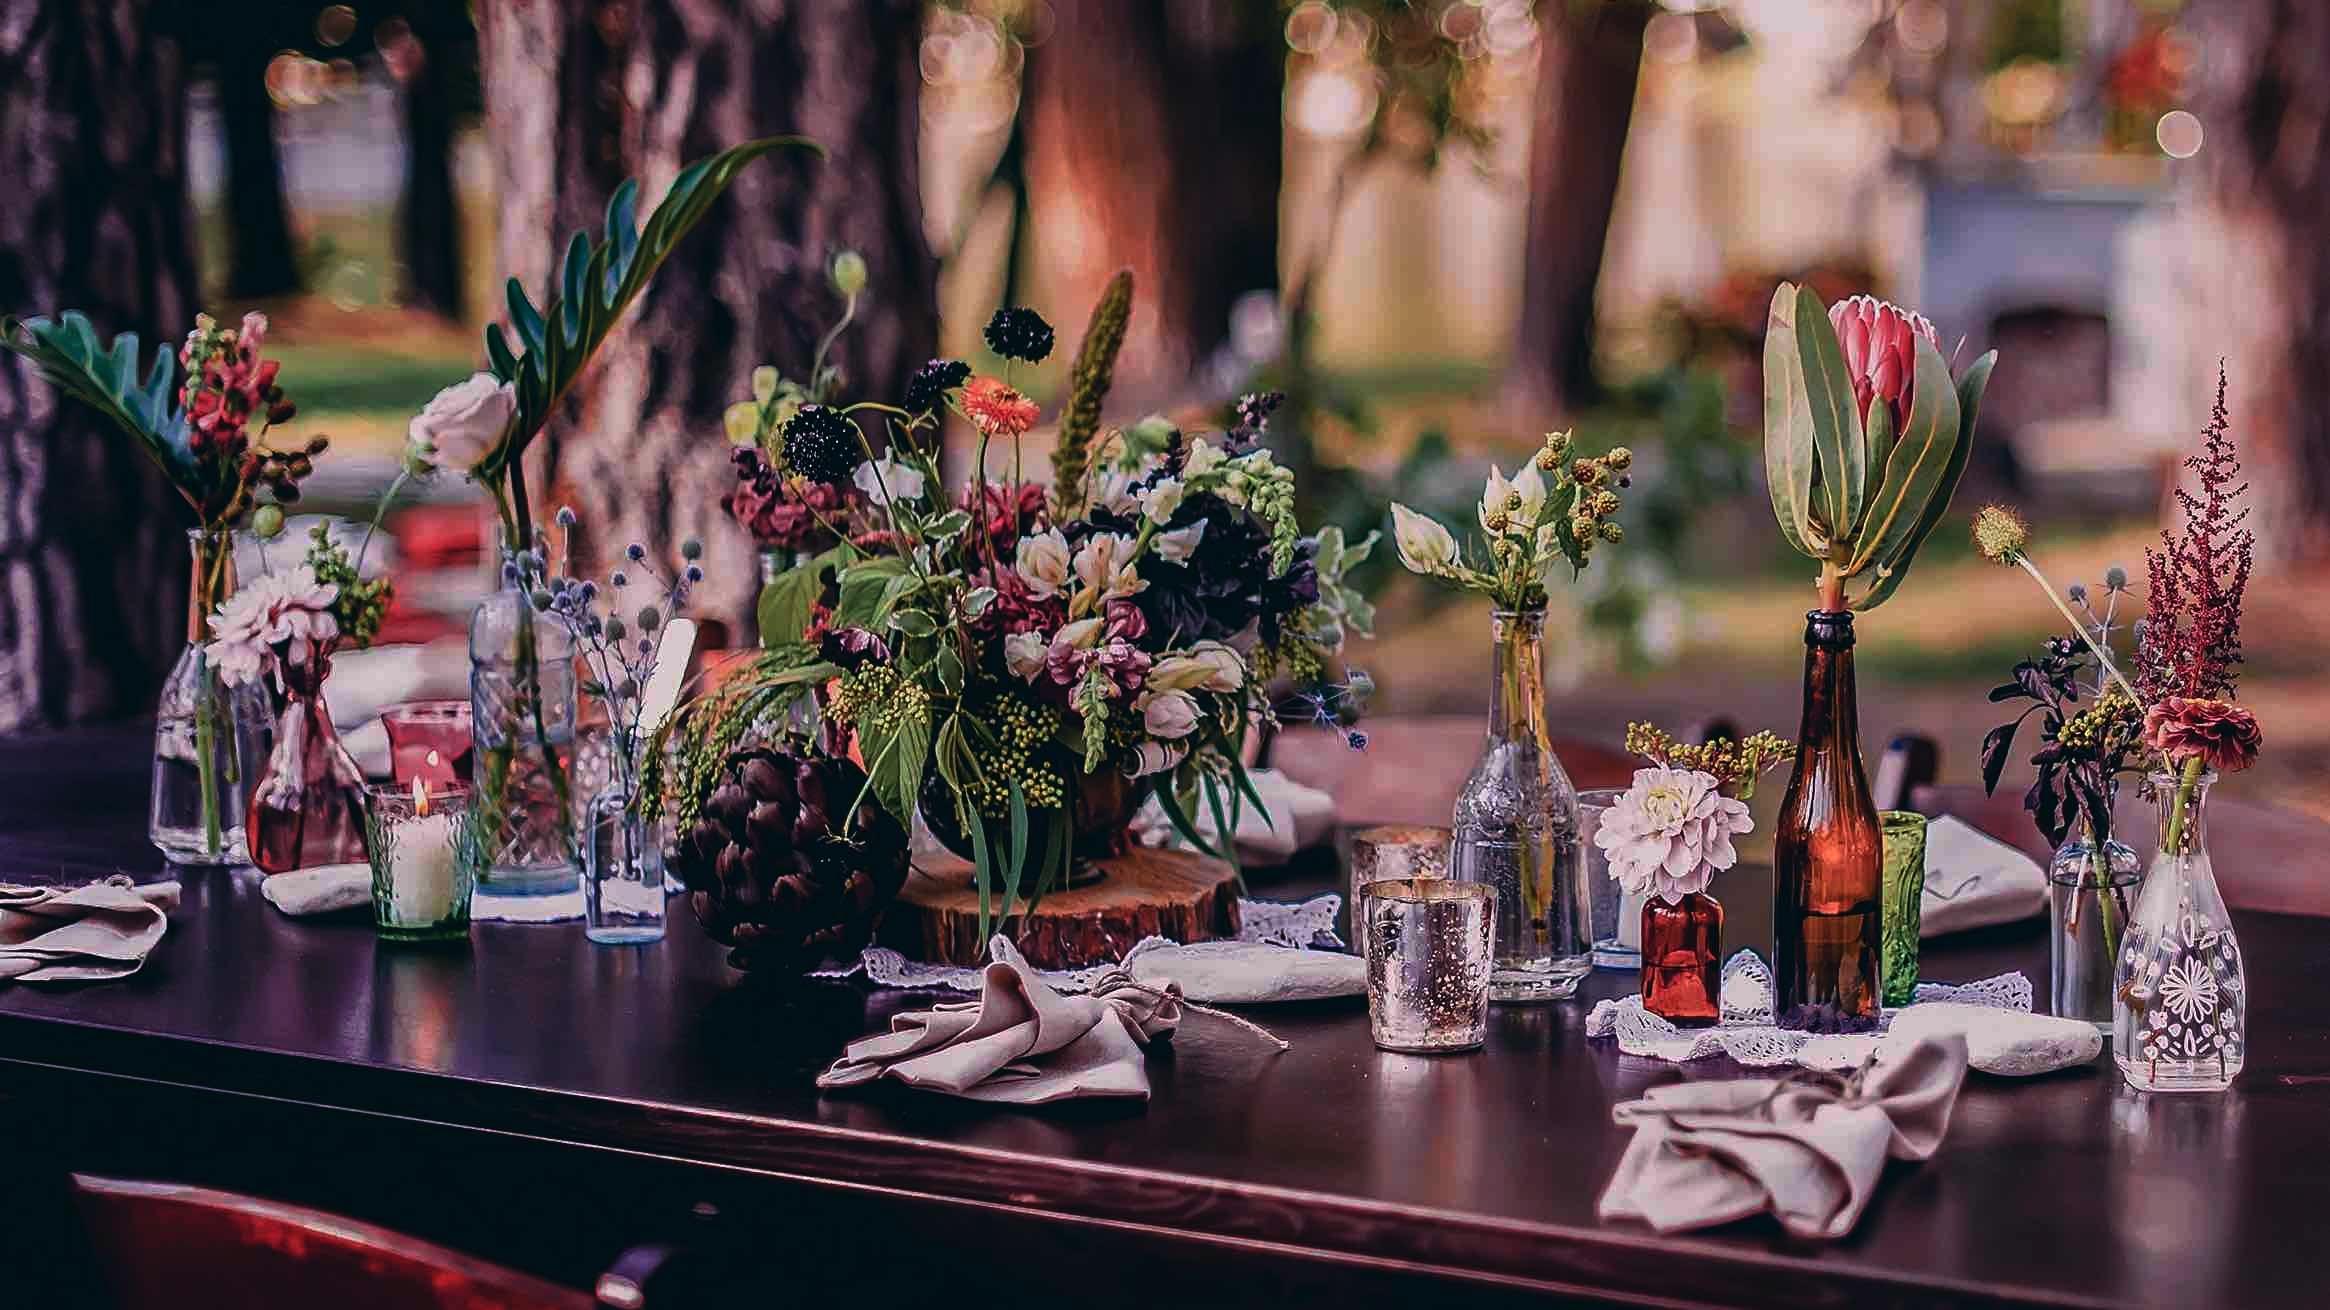 bushland table setting.jpg